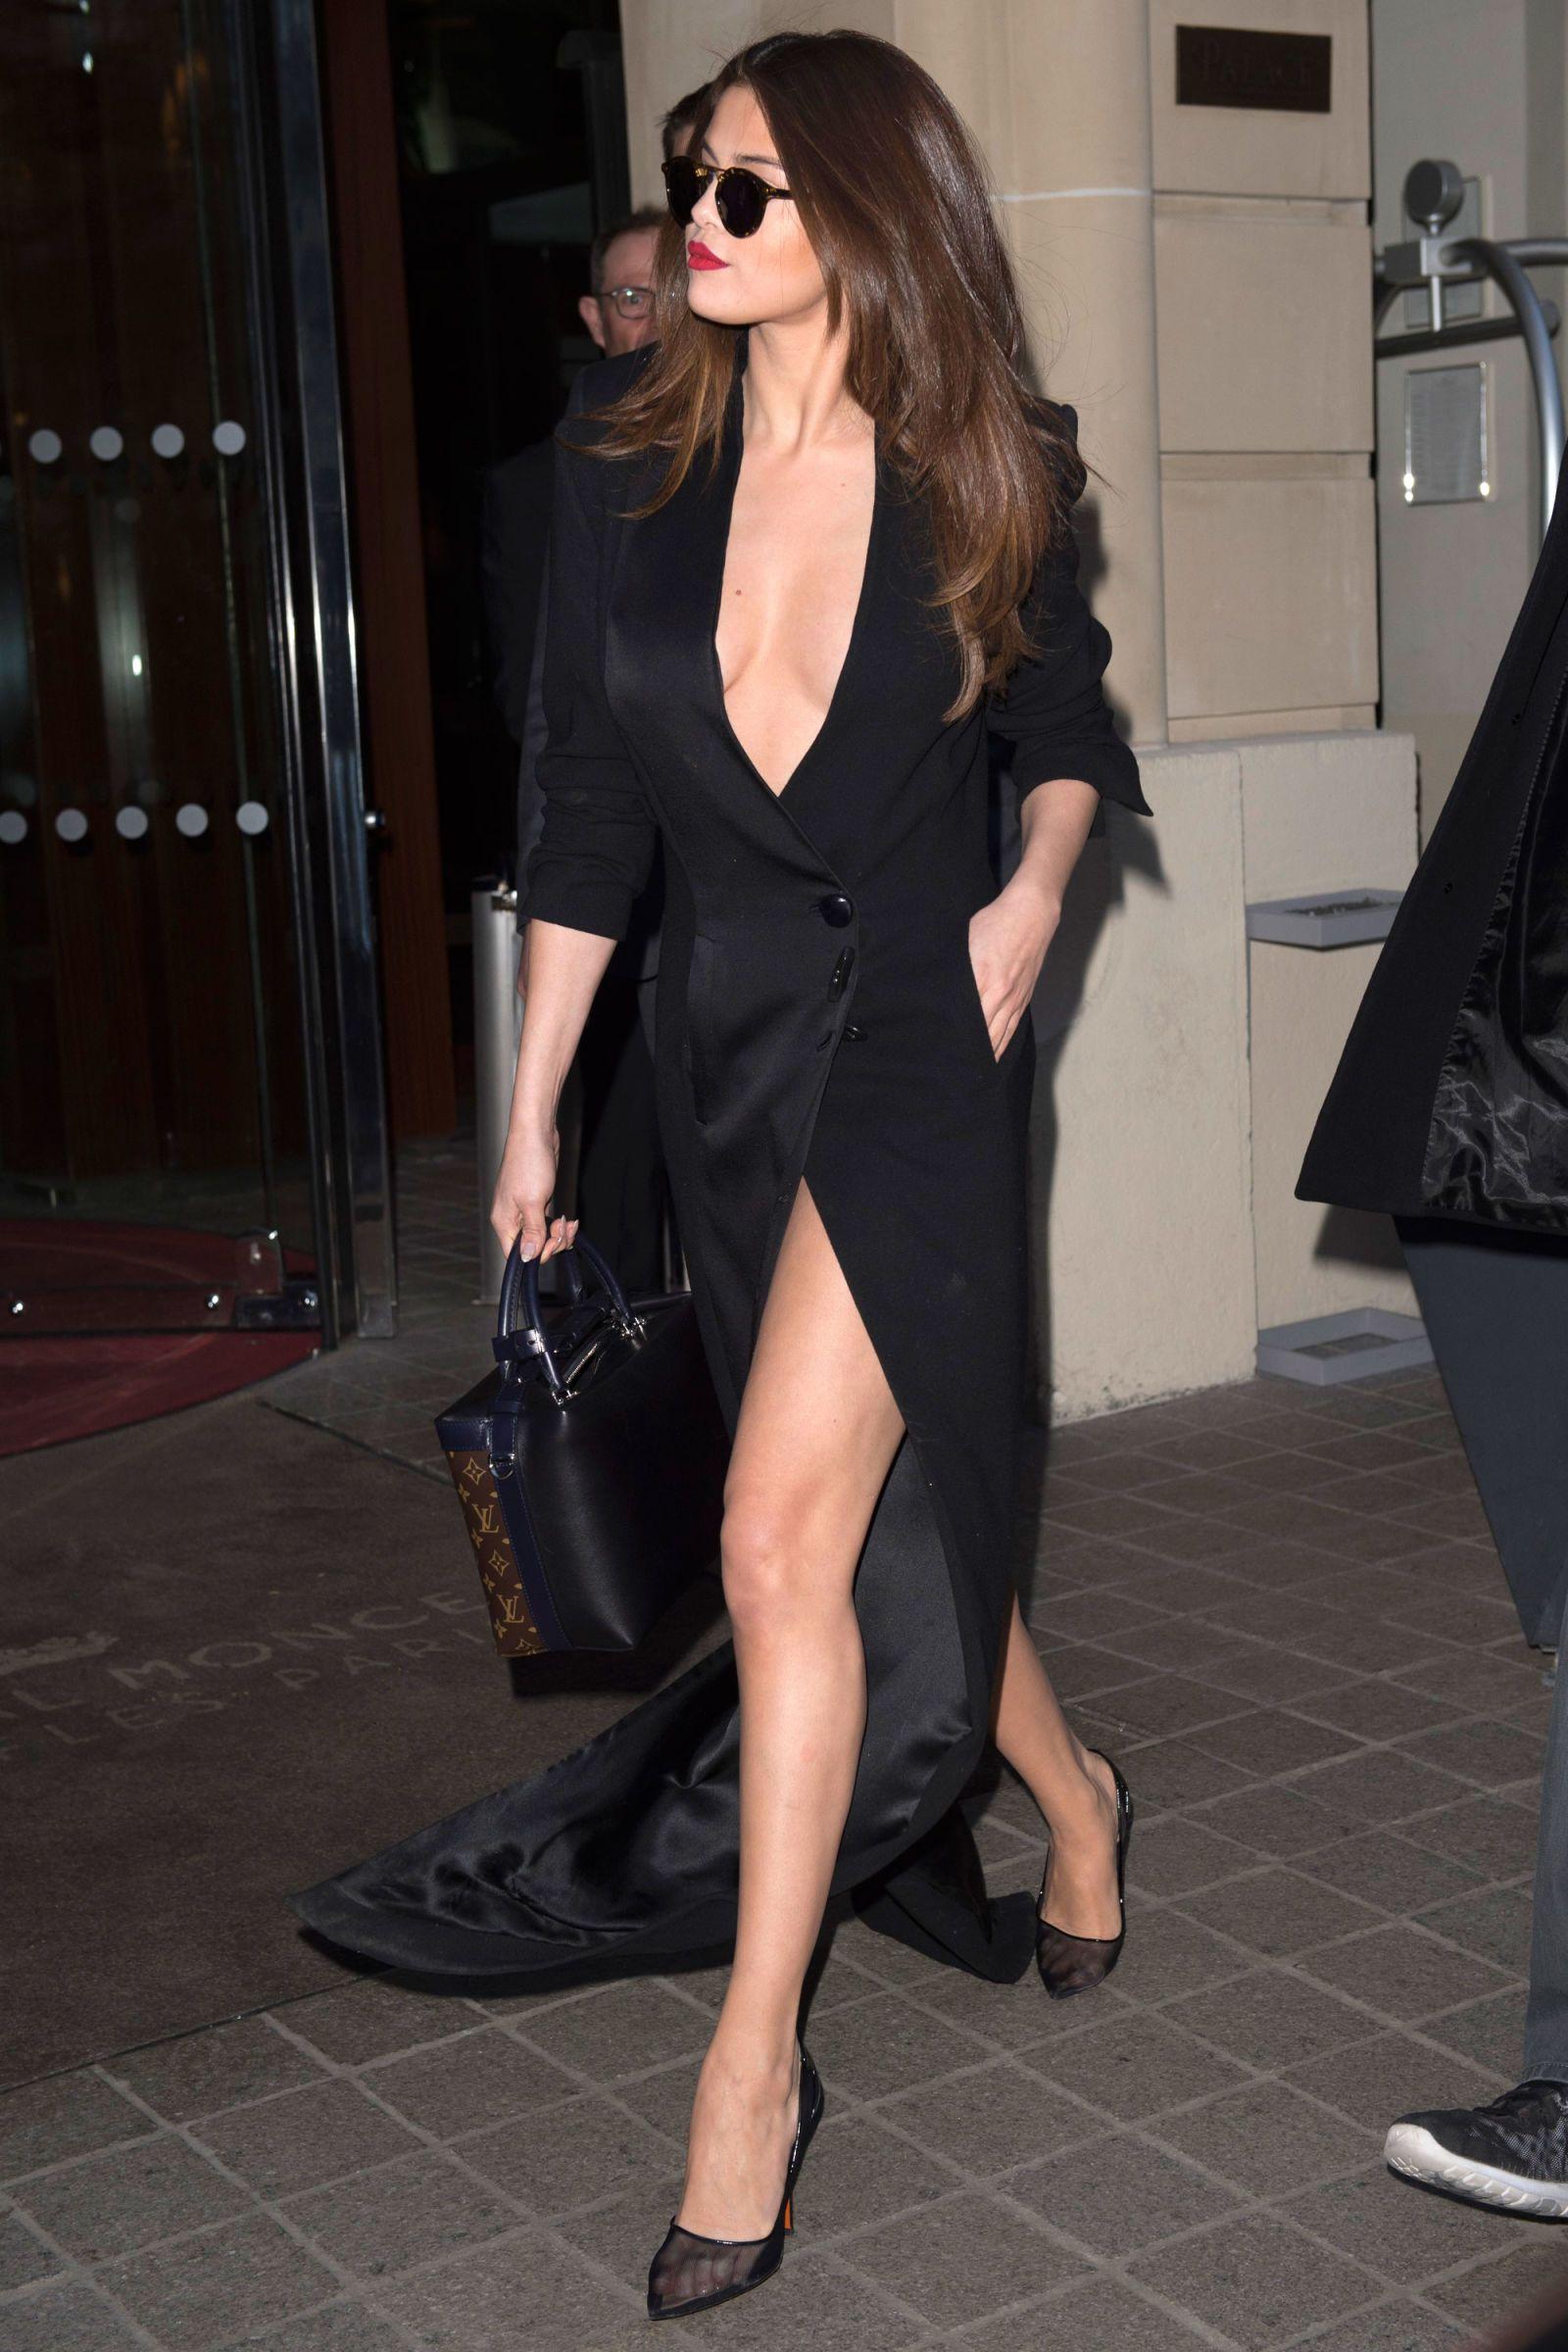 196e01e35 Selena Gomez In a RVDK/Ronald Van Der Kemp dress, Christian Dior sunglasses,